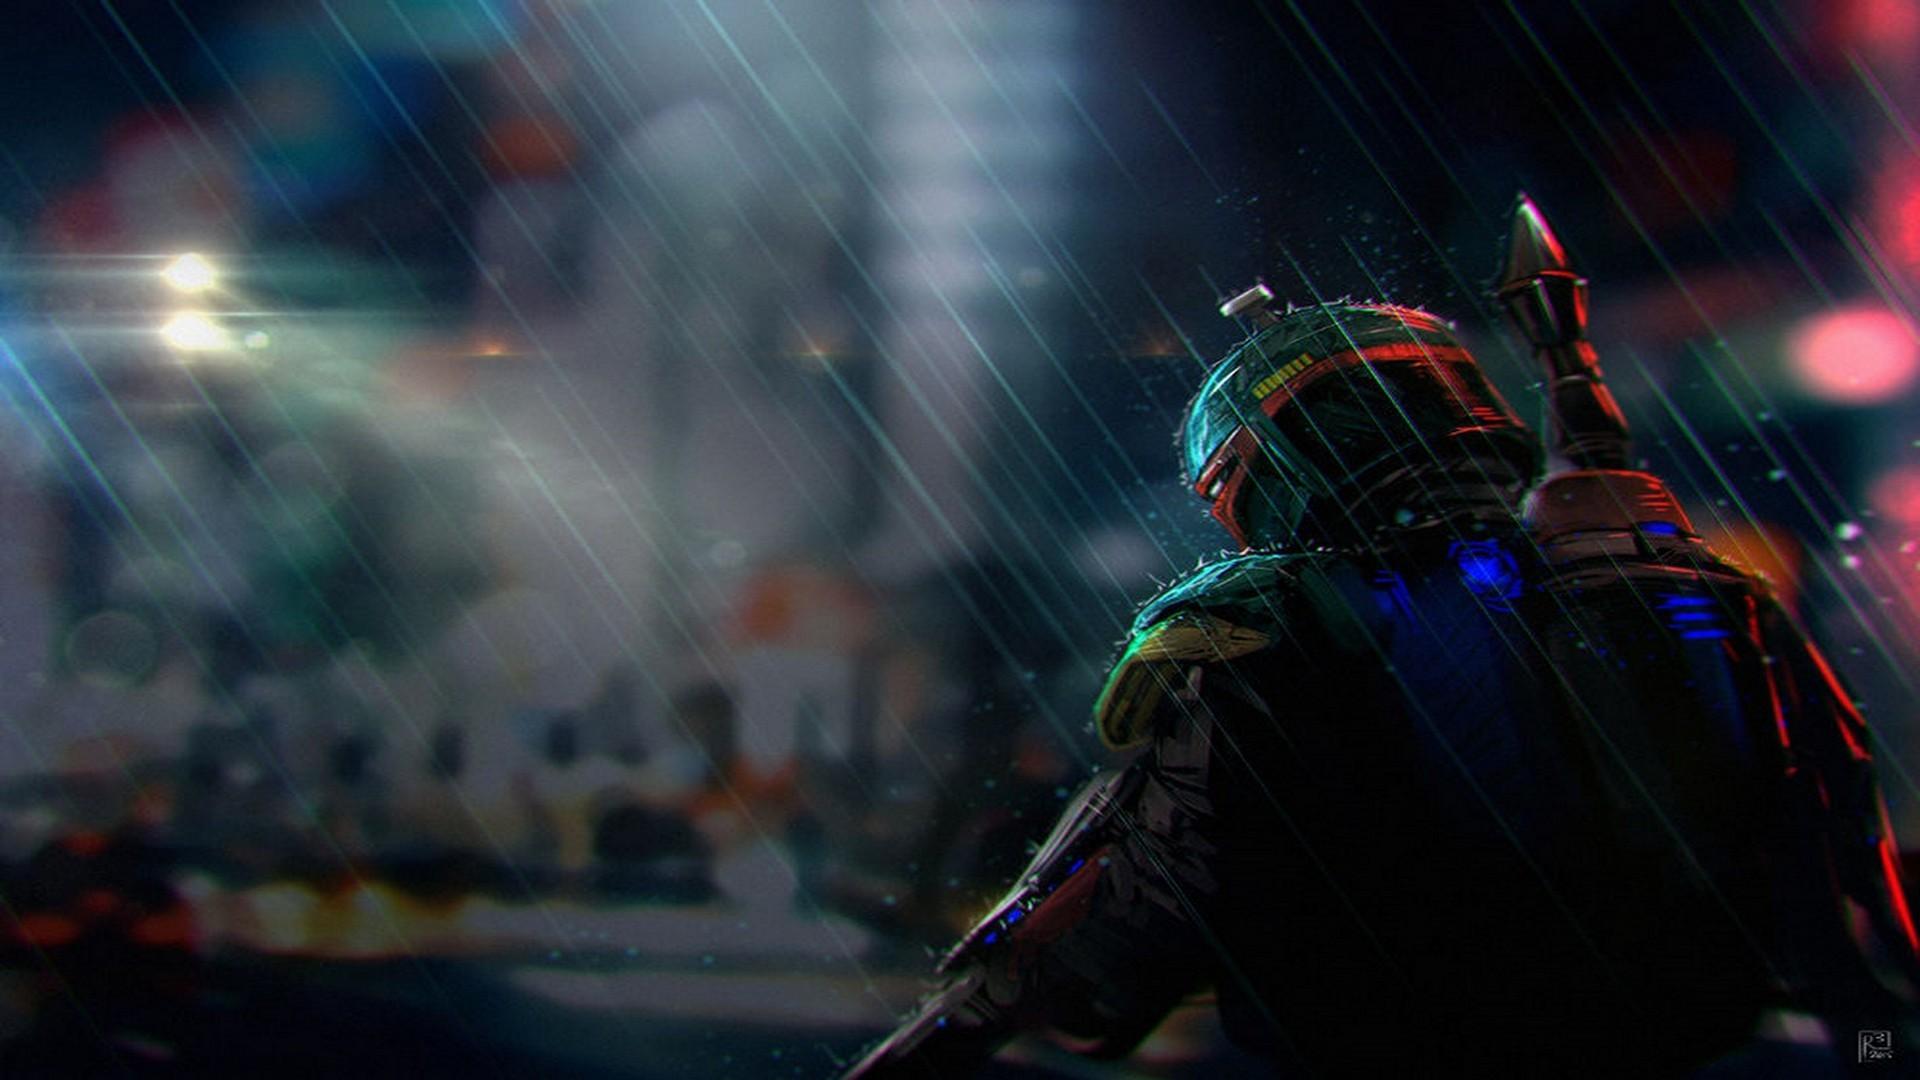 Boba Fett in the rain.